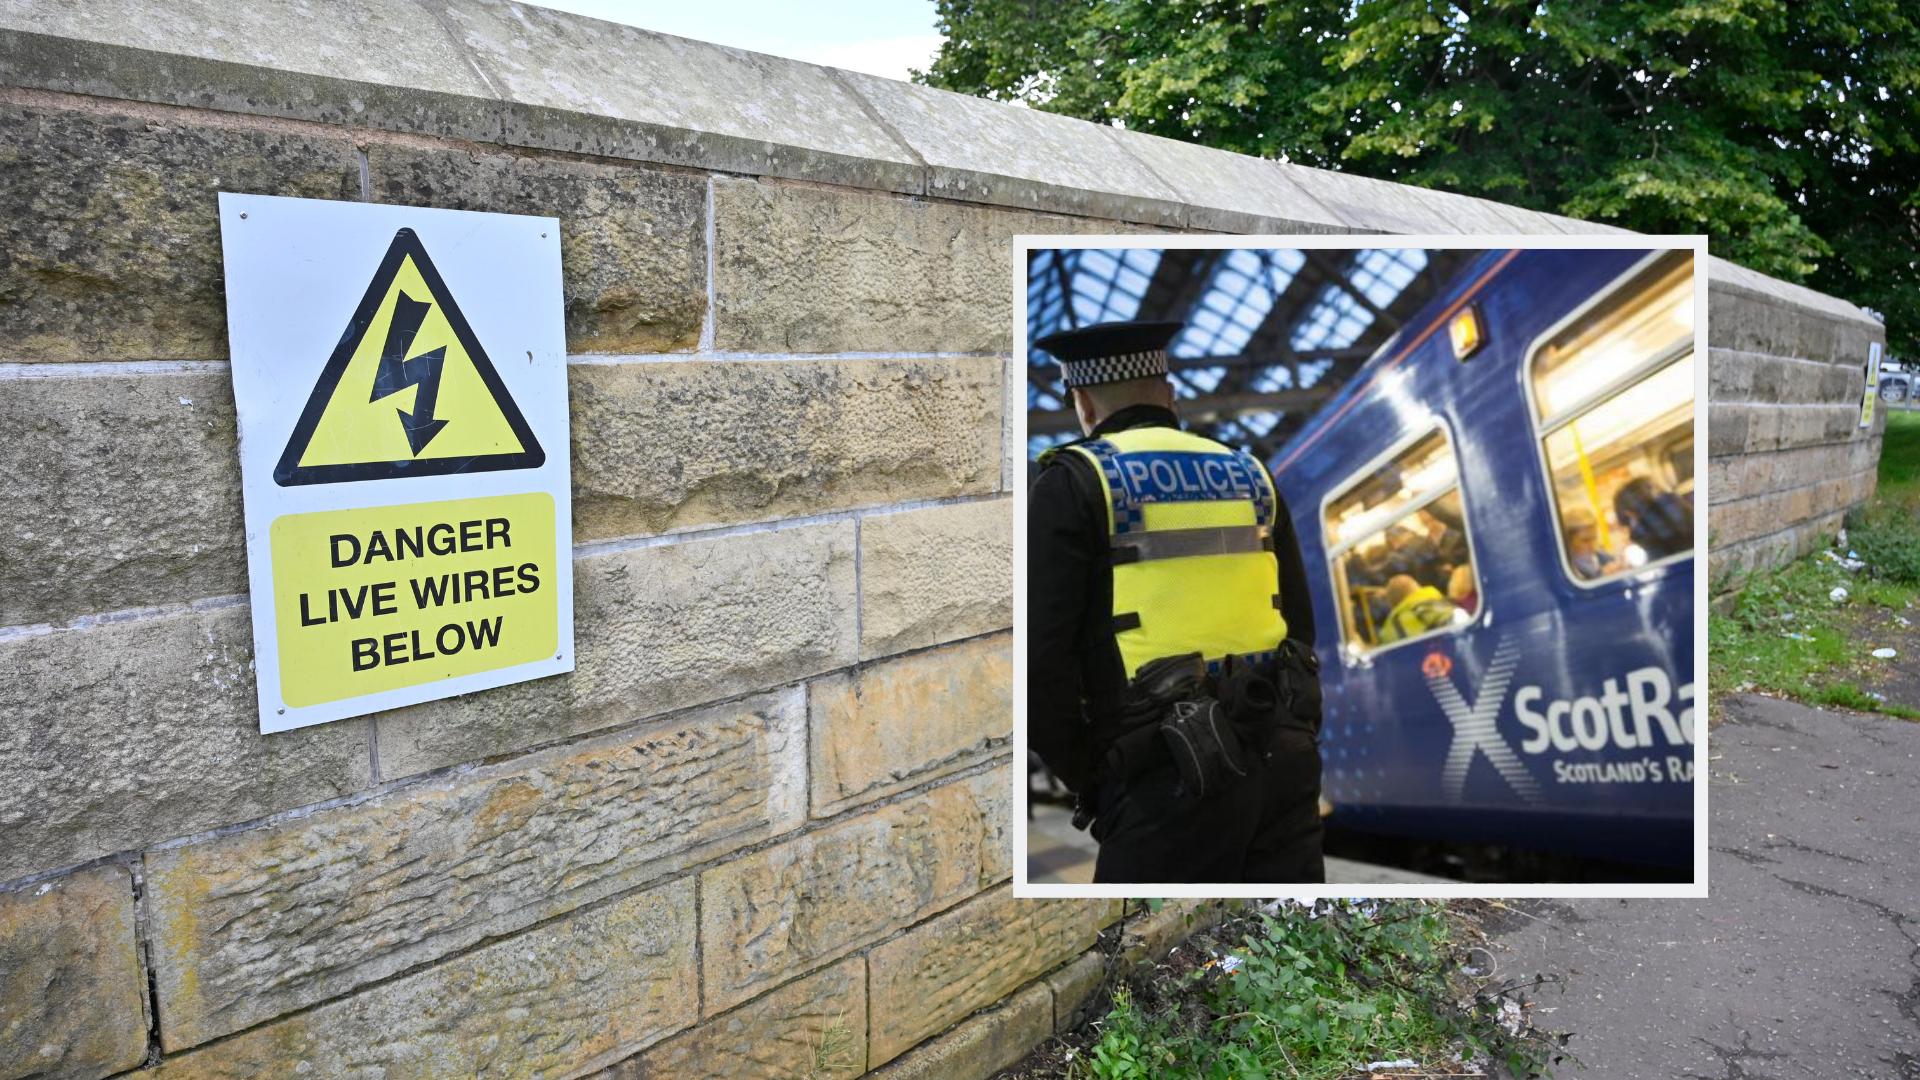 Glasgow schoolboy, 12, dies after suffering electric shock on railway at Ashgill Road